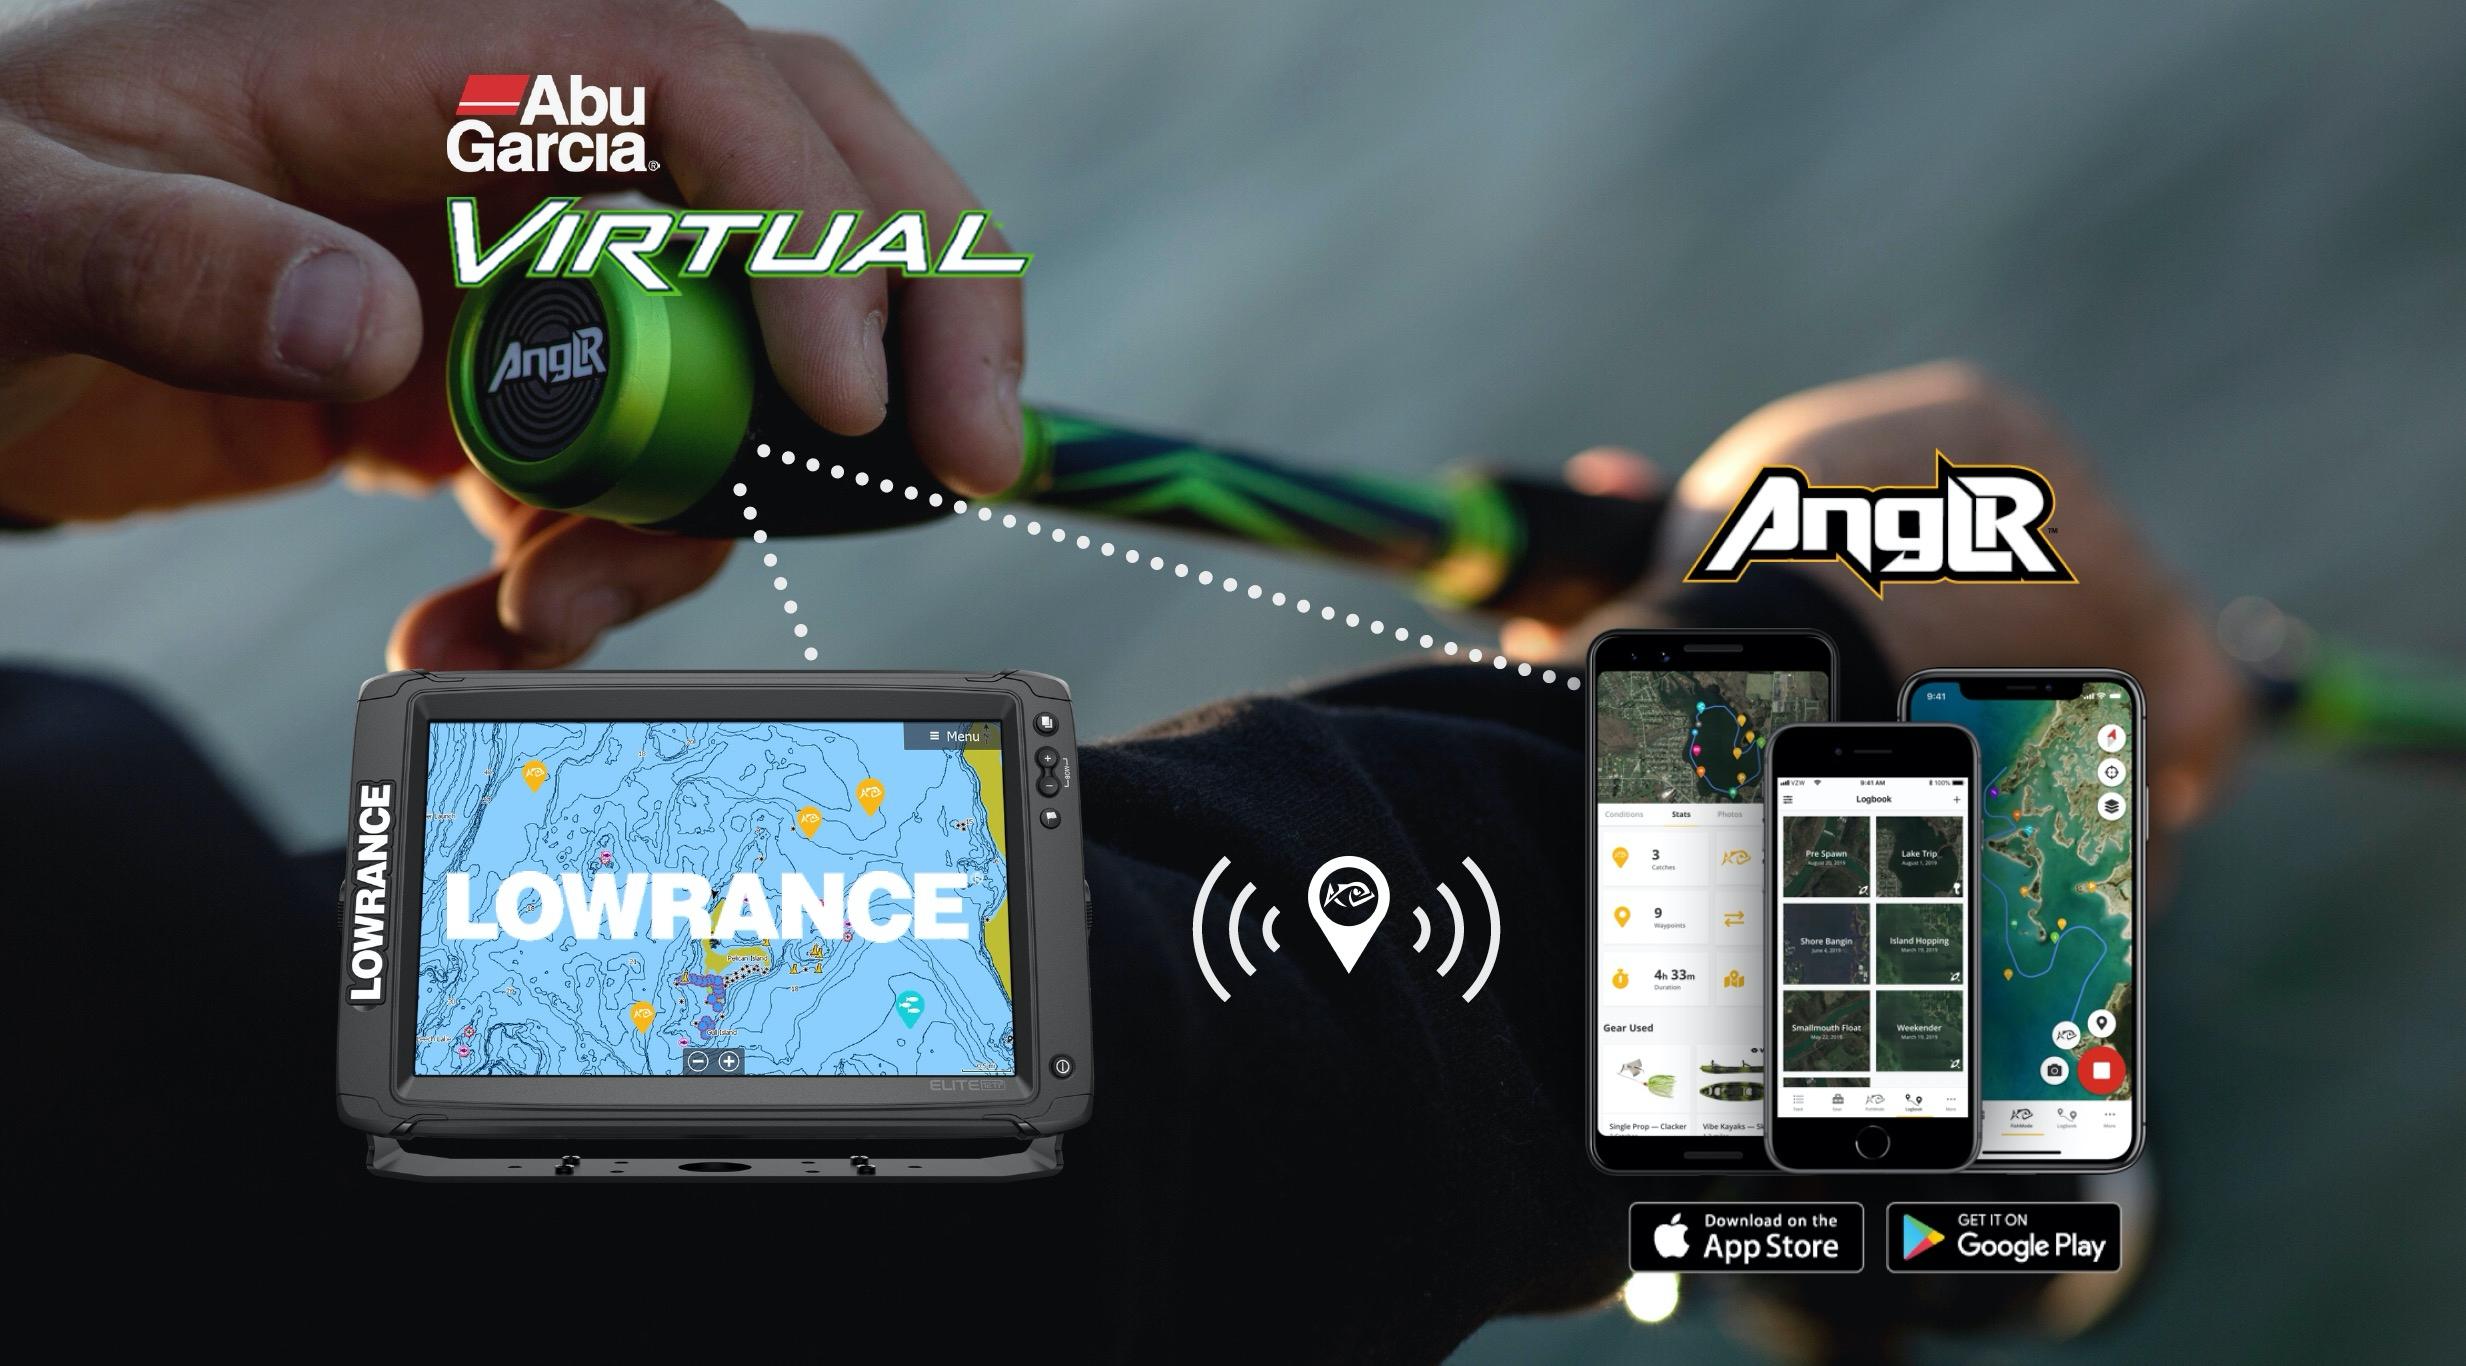 Anglr Virtual System